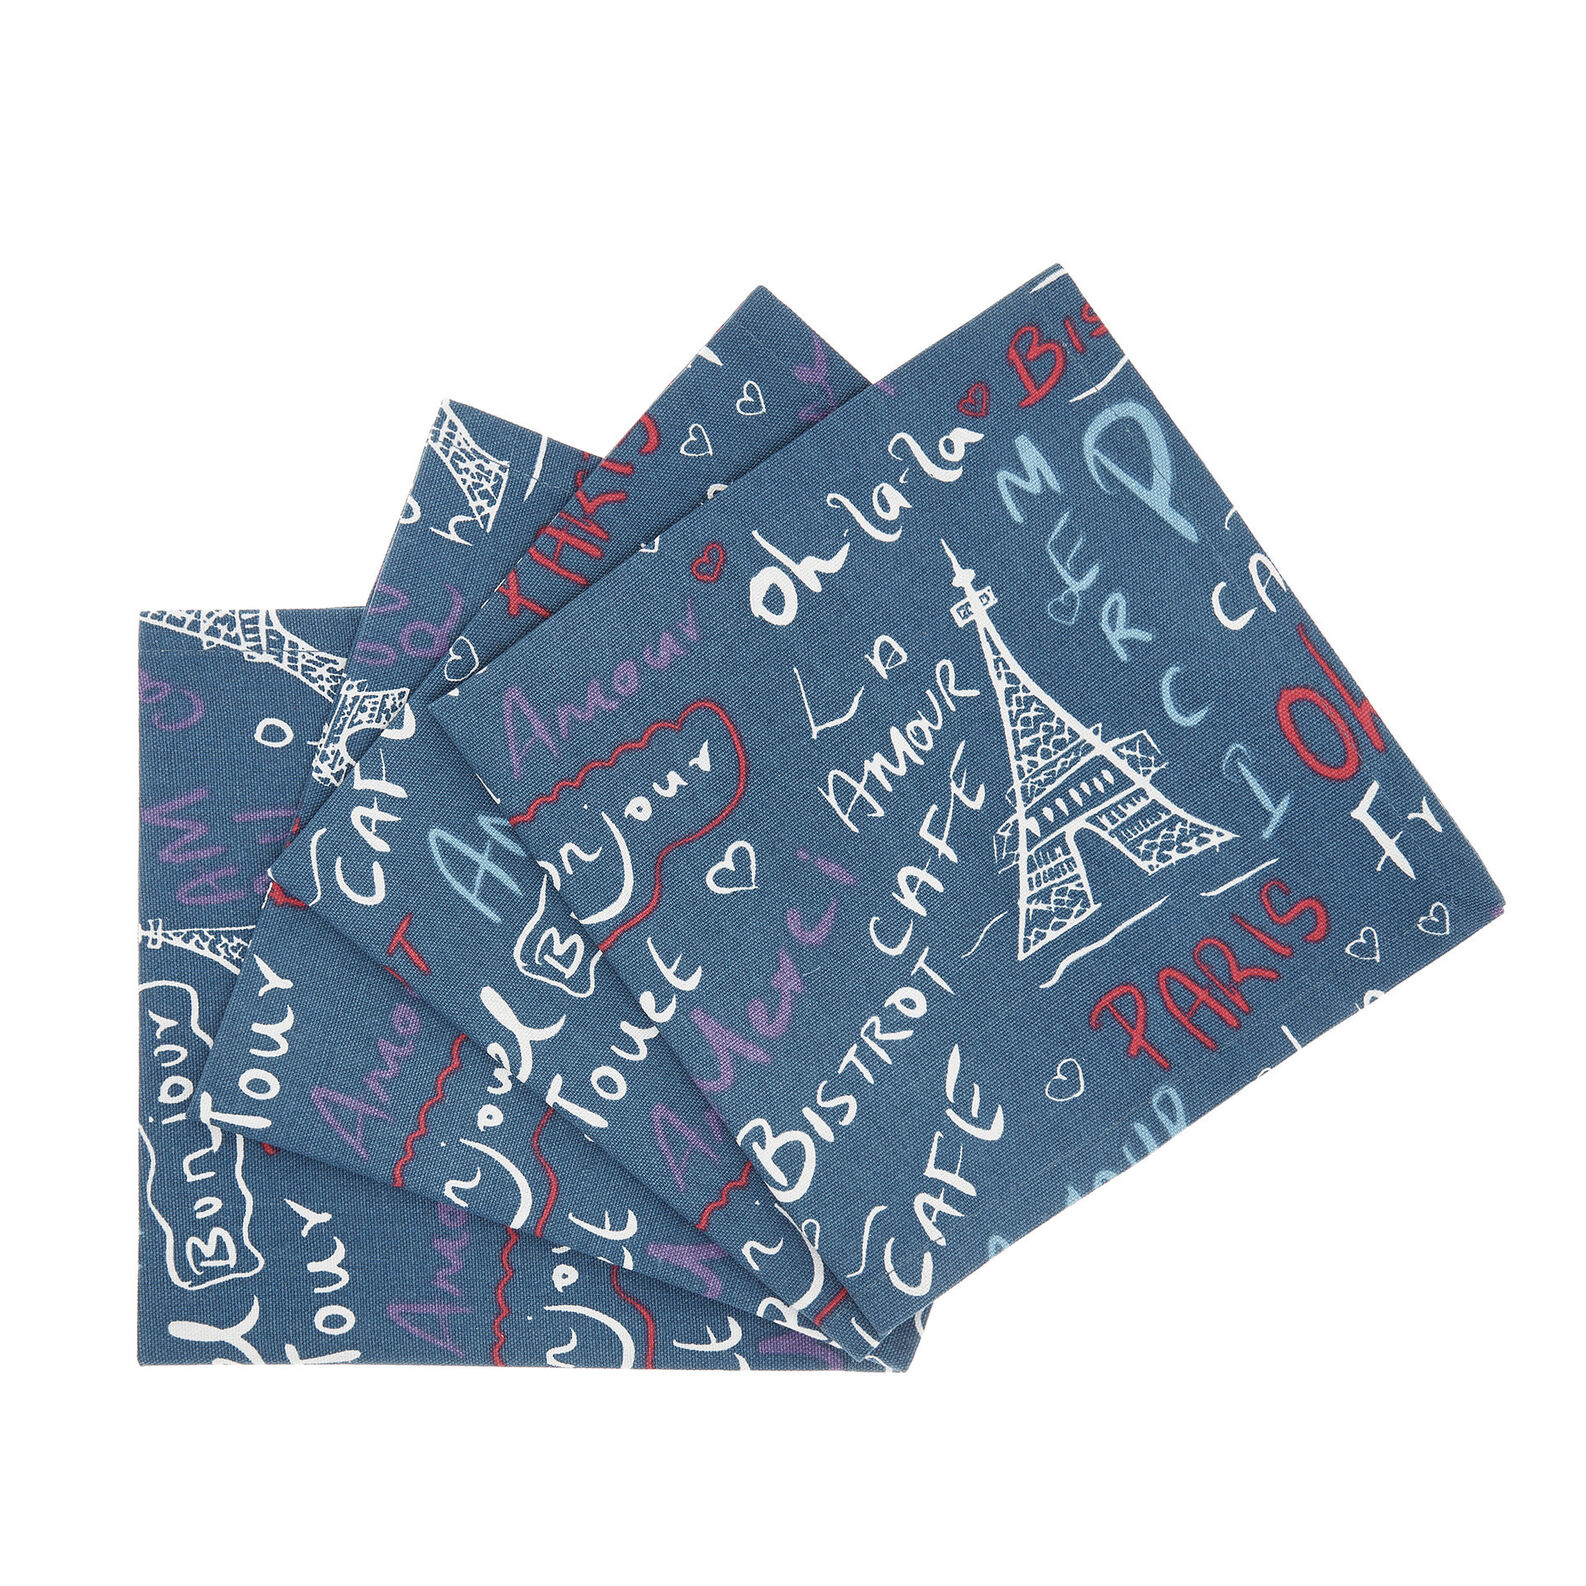 Set of 4 napkins in 100% cotton with Paris print